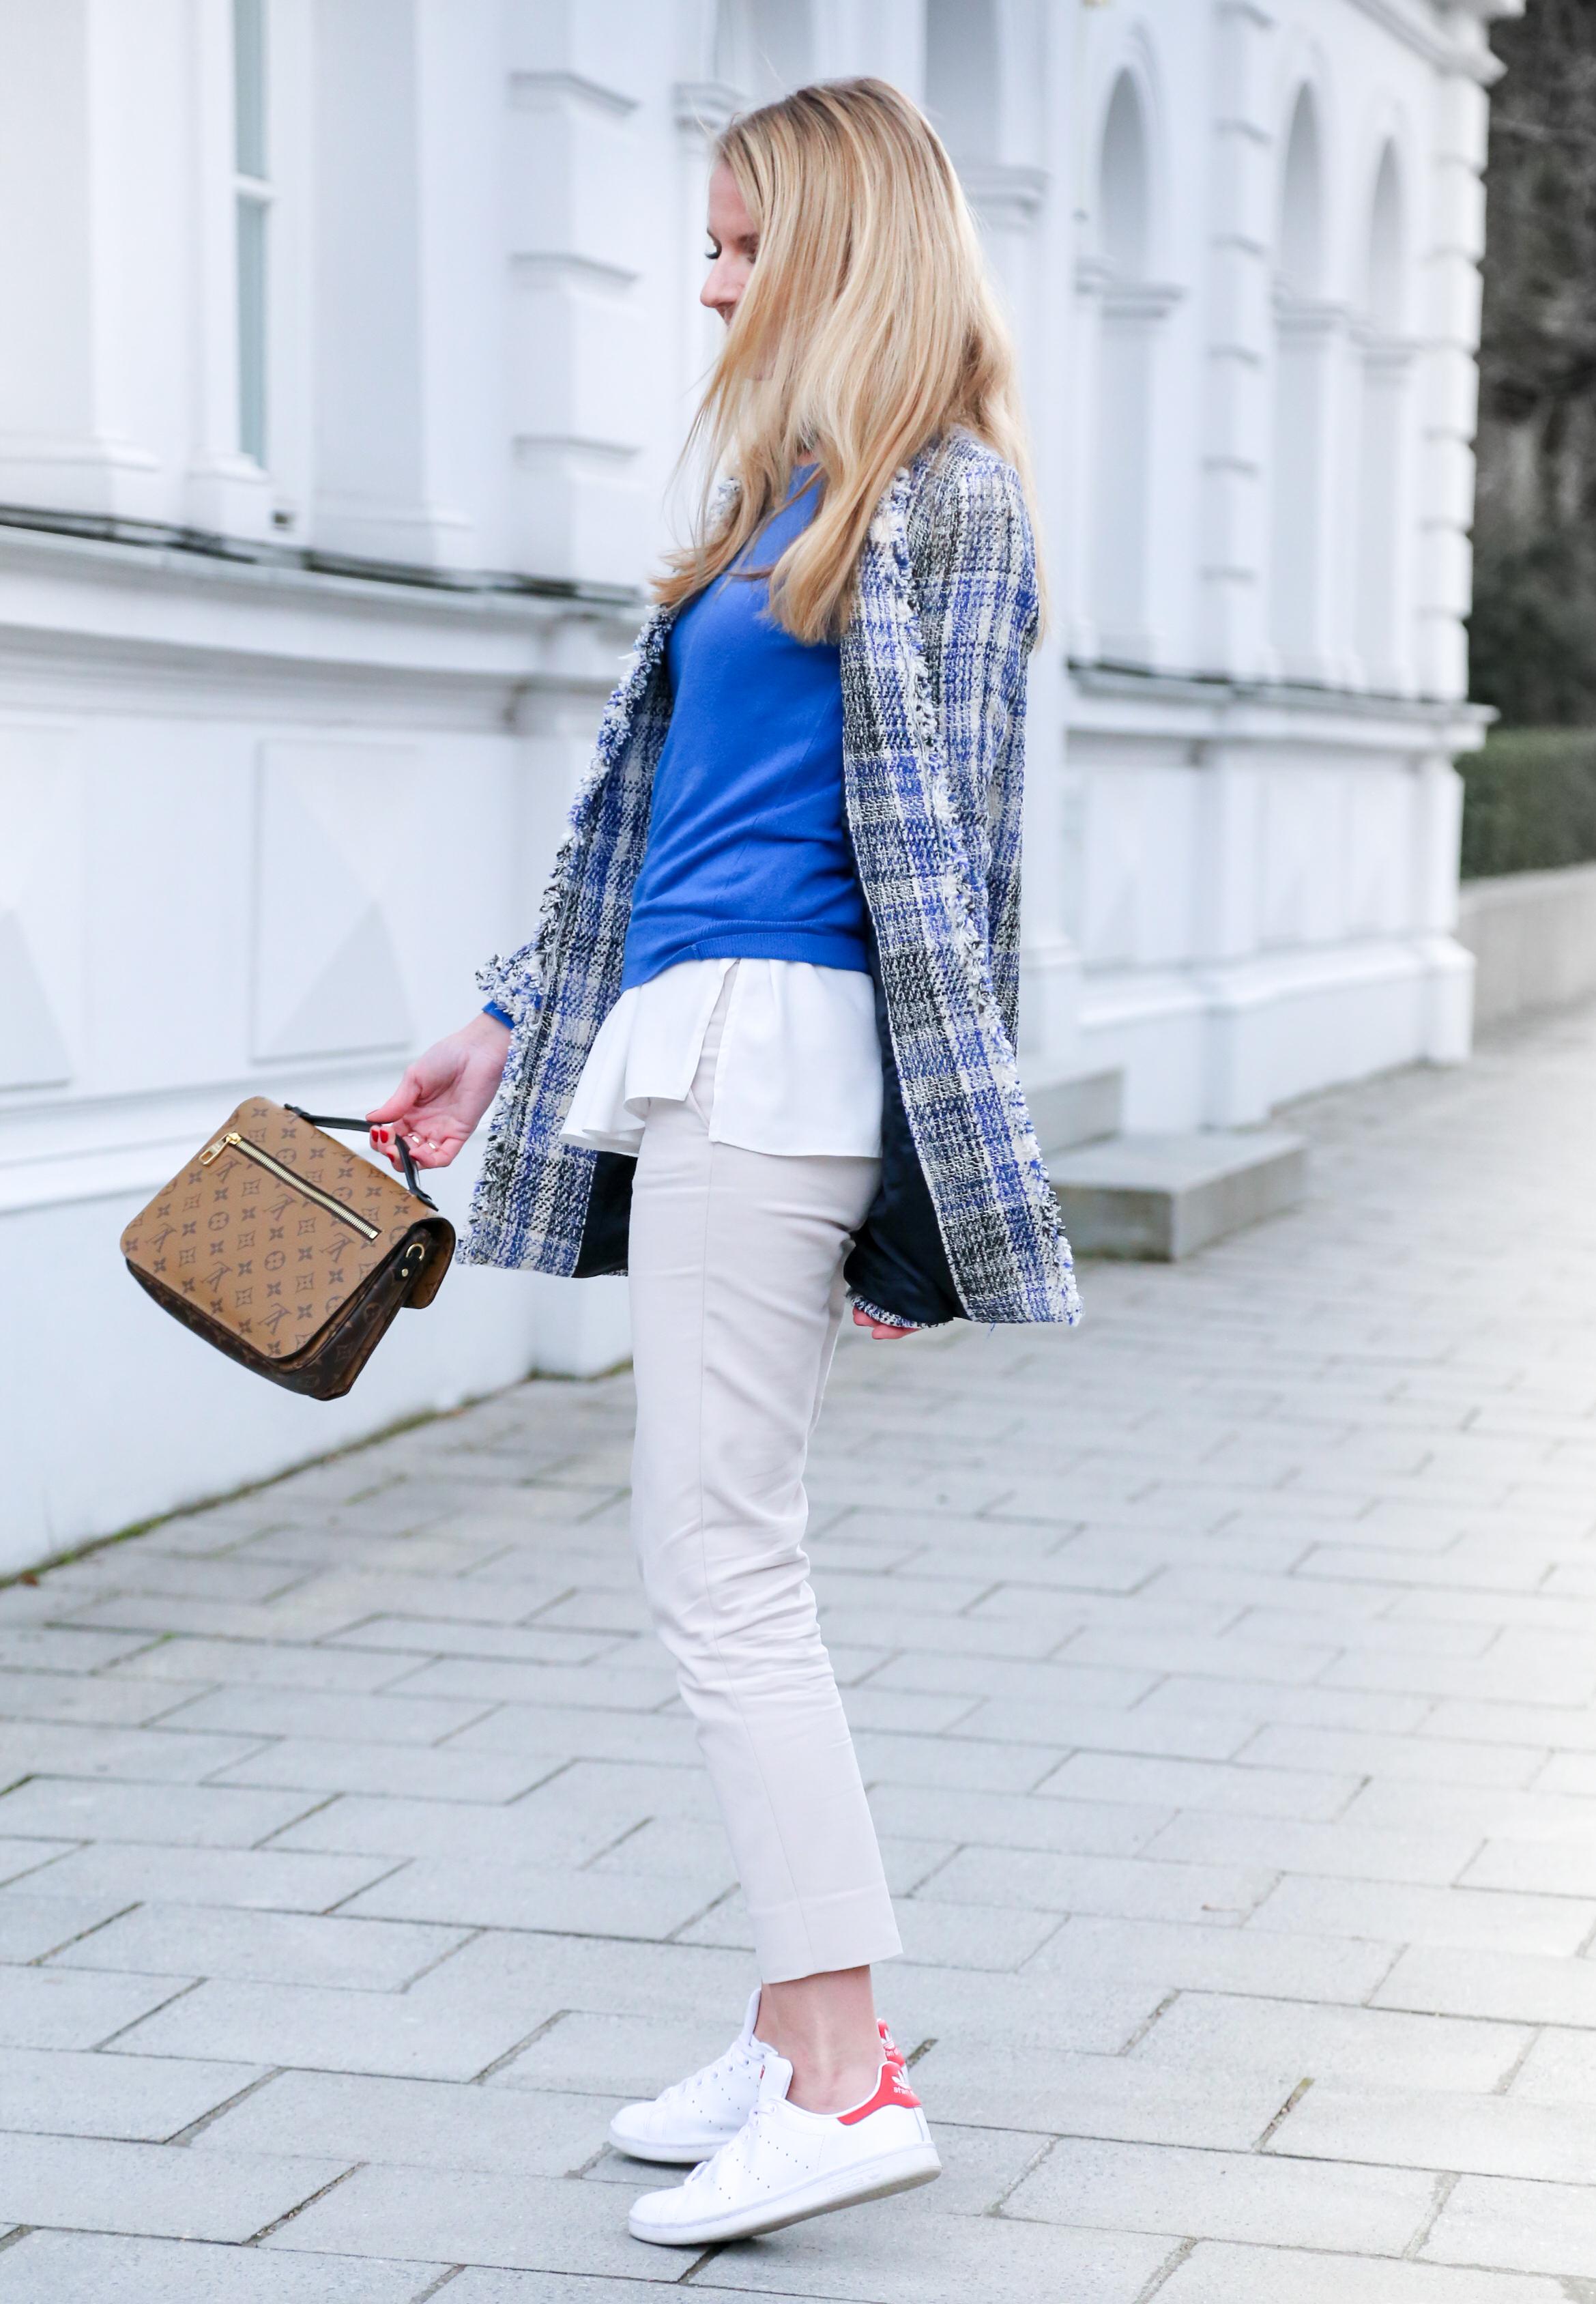 HELLO SPRING mit Tweed Mantel, Chino und Pochette Métis Revers Zara Benetton Adidas StanSmith Asos LV LouisVuitton LVOE Metis Fashion Outfit Jennifer PepperAndGold